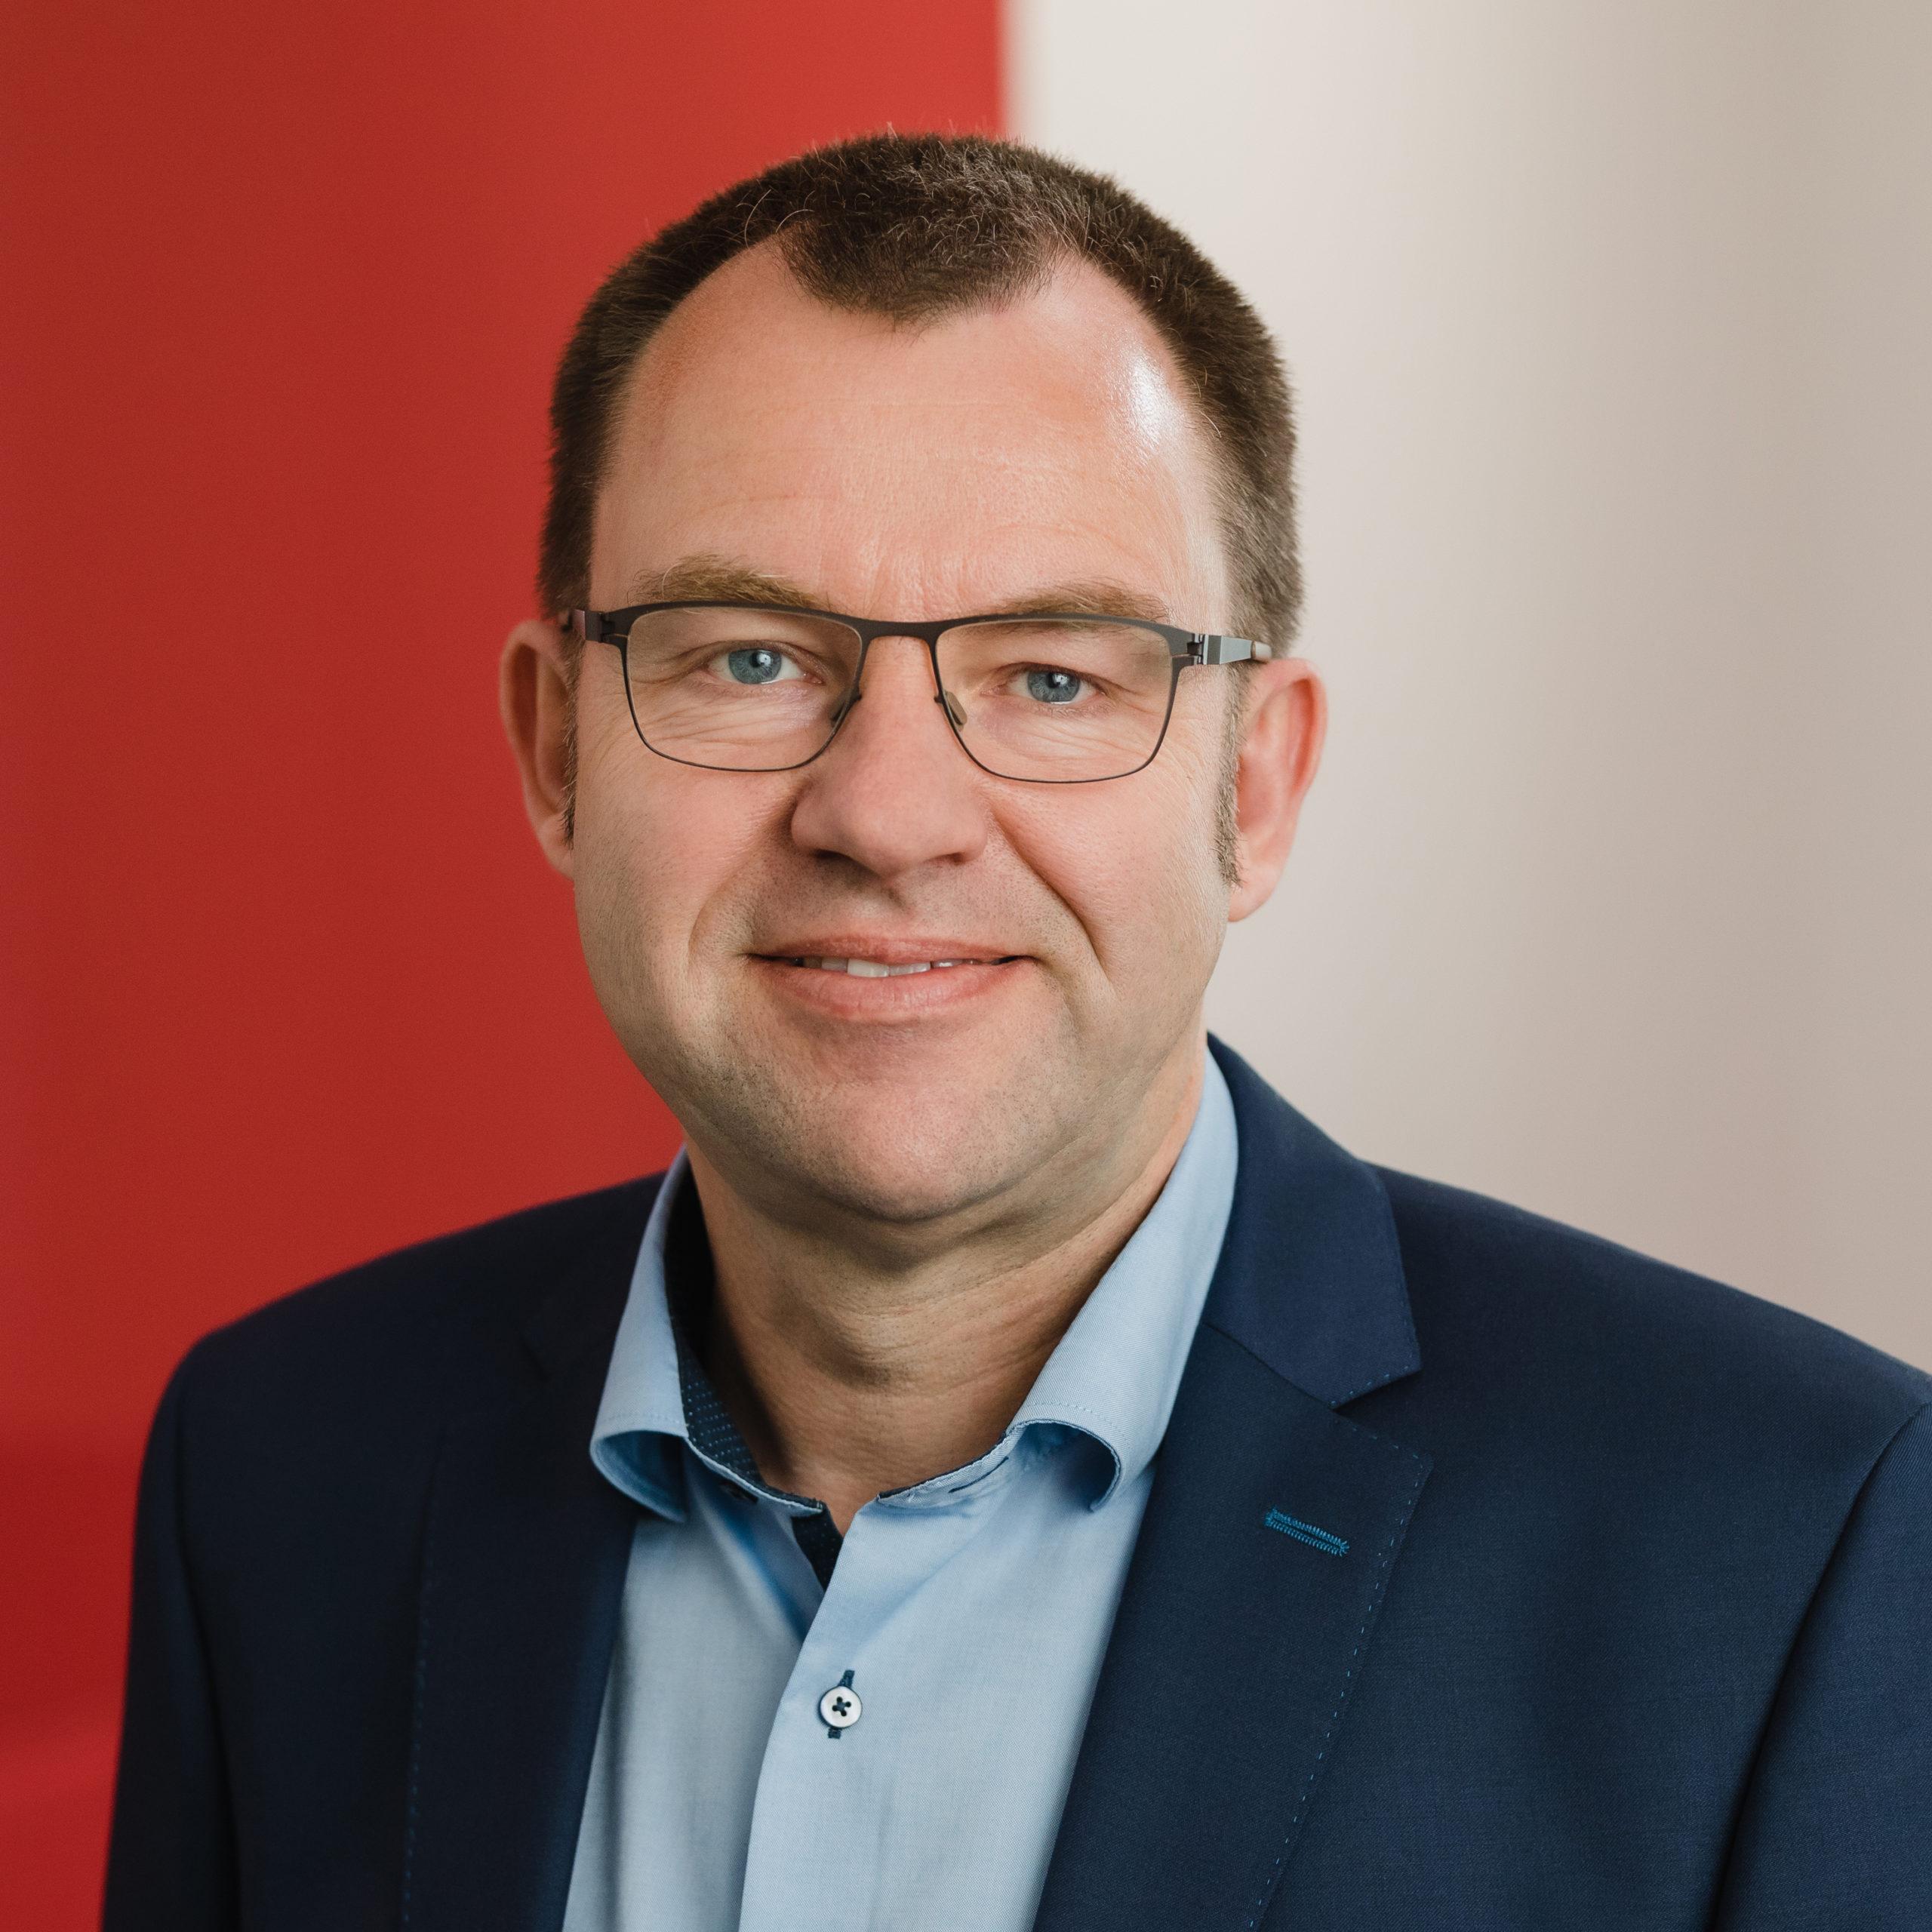 Prof. Dr. Frank Ziegele